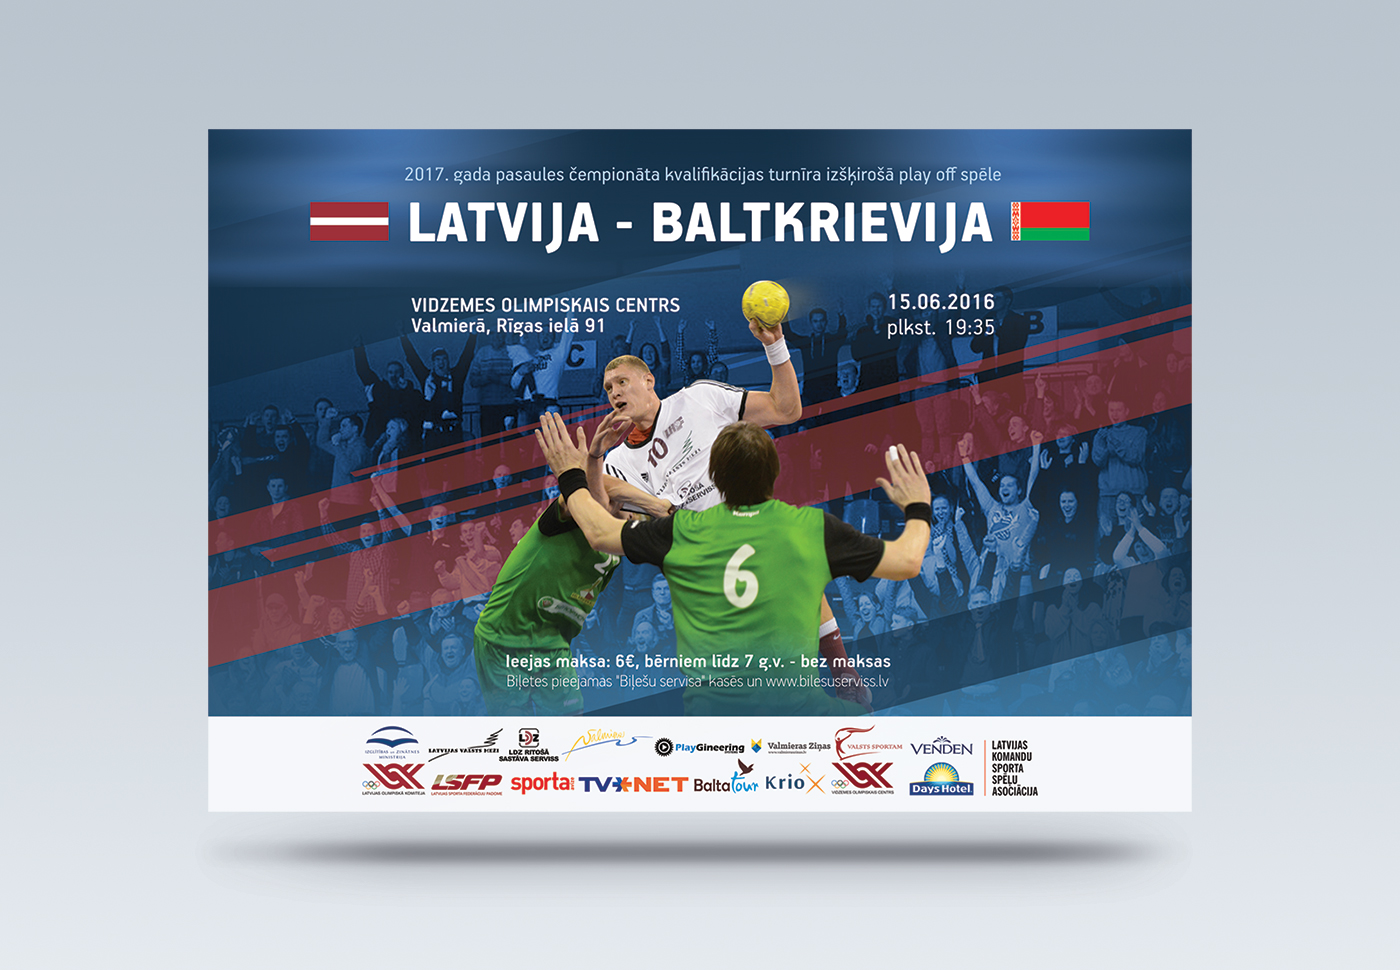 Плакат для чемпионата по гандболу